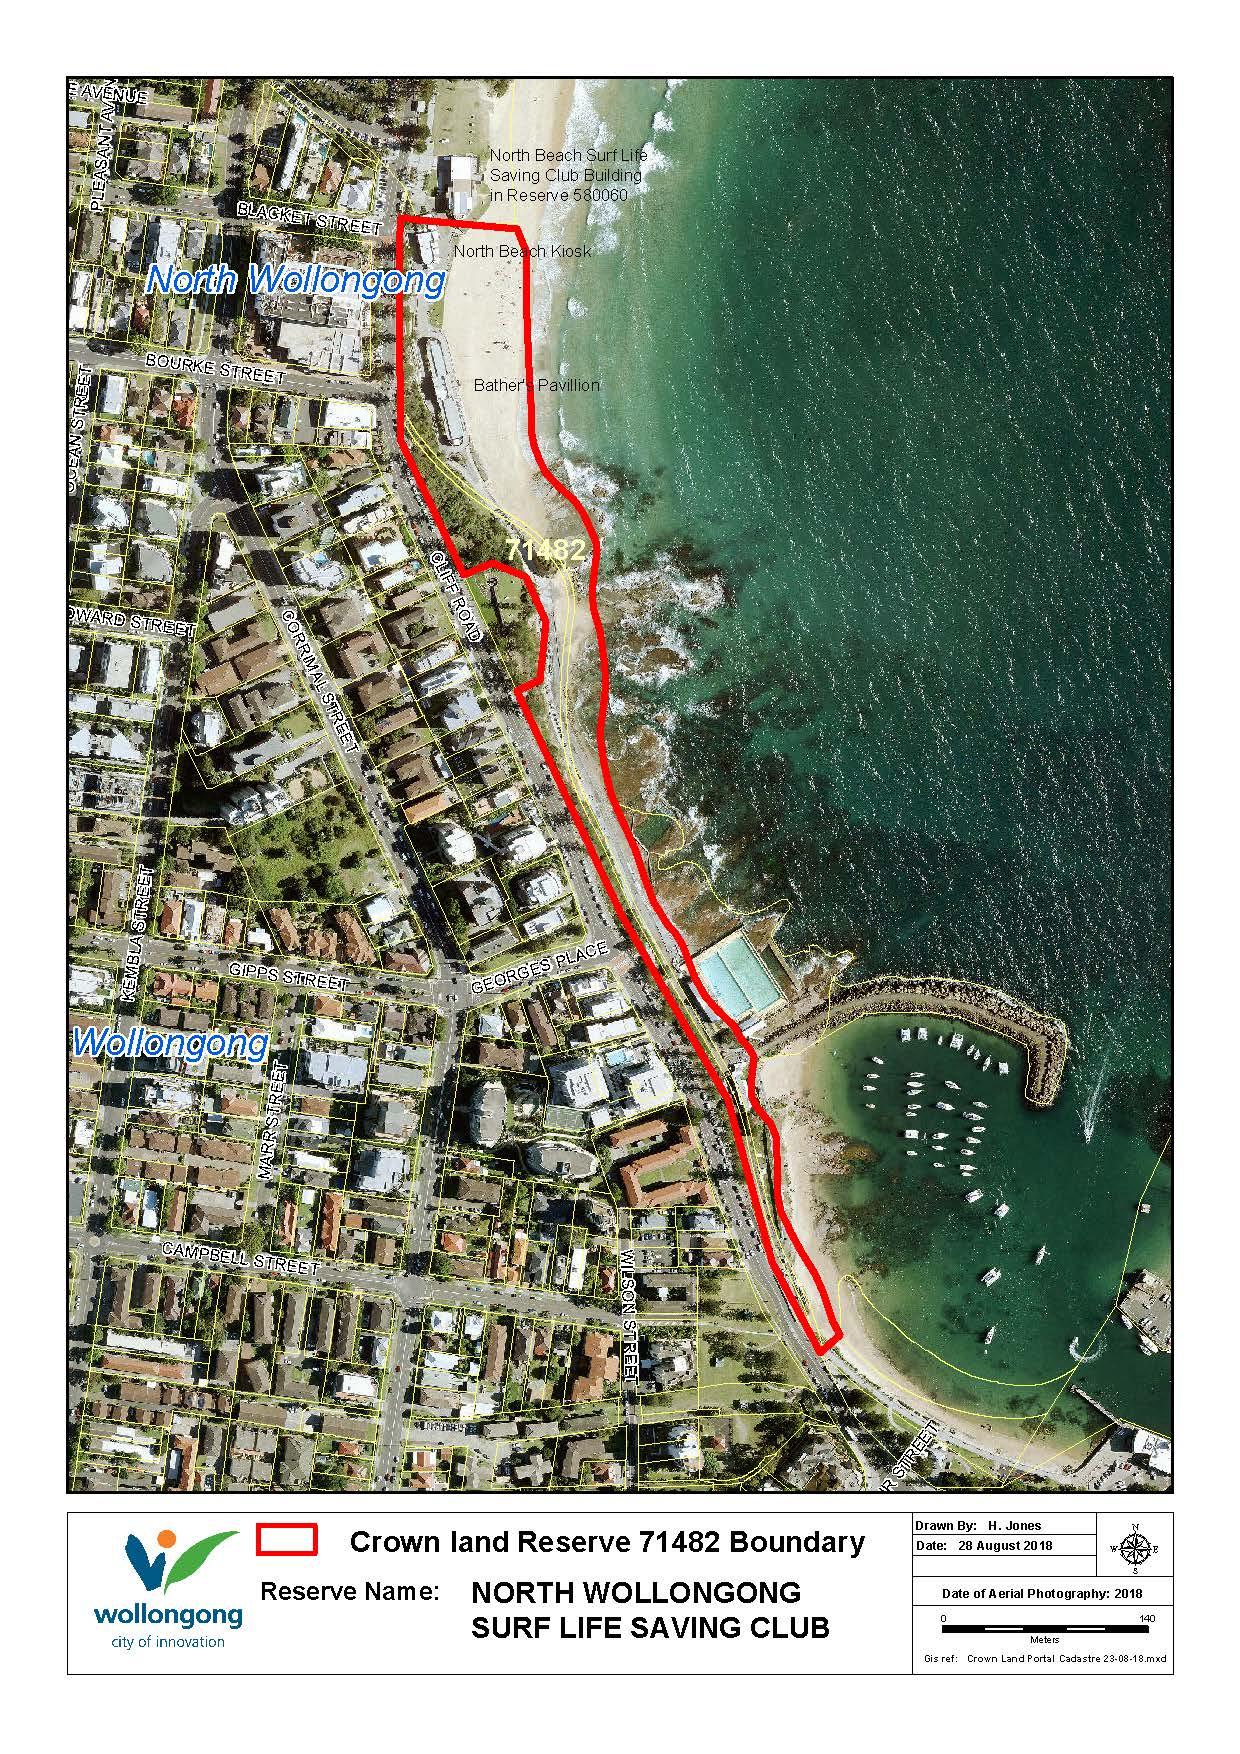 North beach surf club reserve 71482 map z19 91574